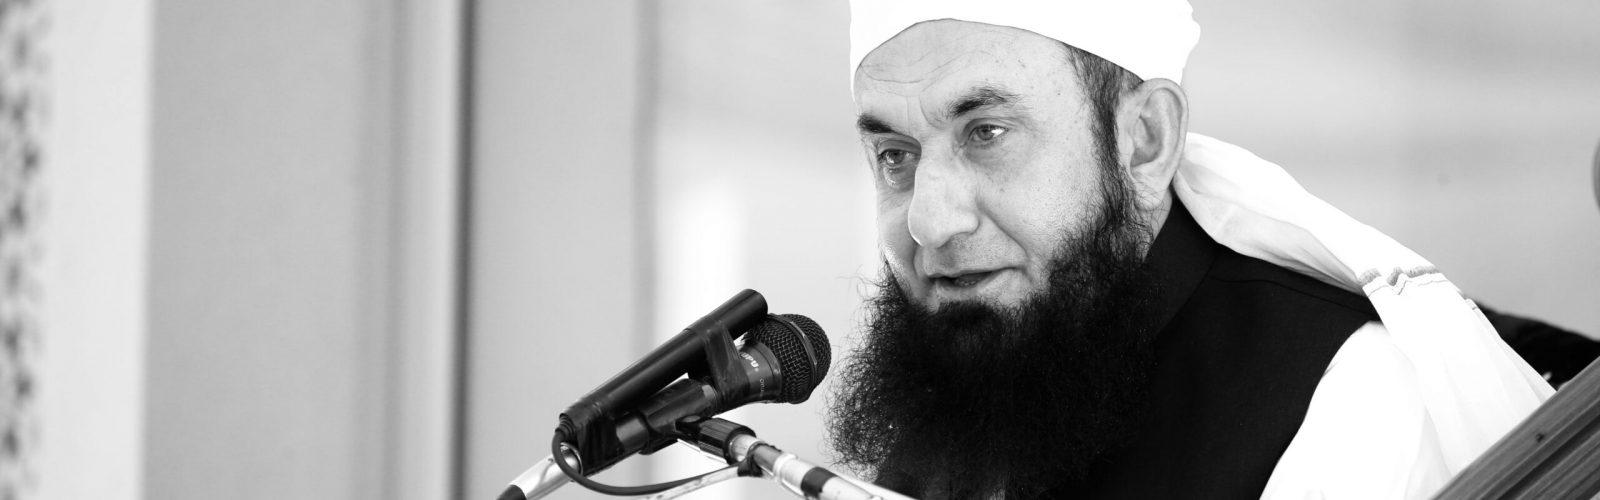 Maulana Tariq Jamil Official Website